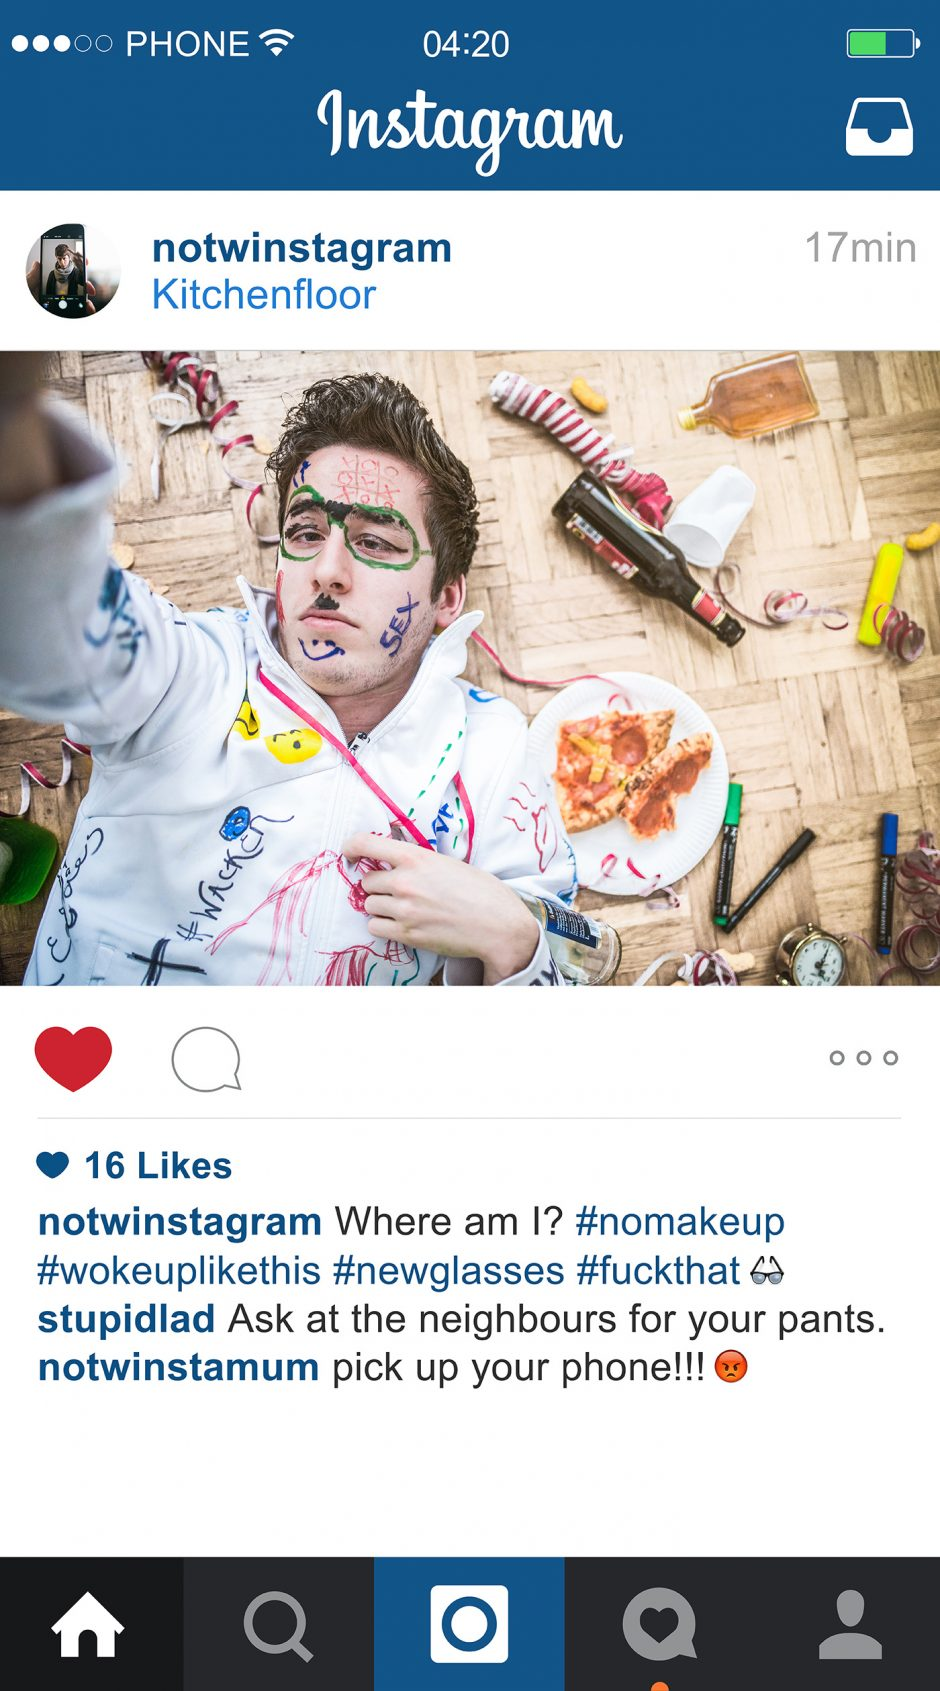 NOTWInstagram – Wokeuplikethis